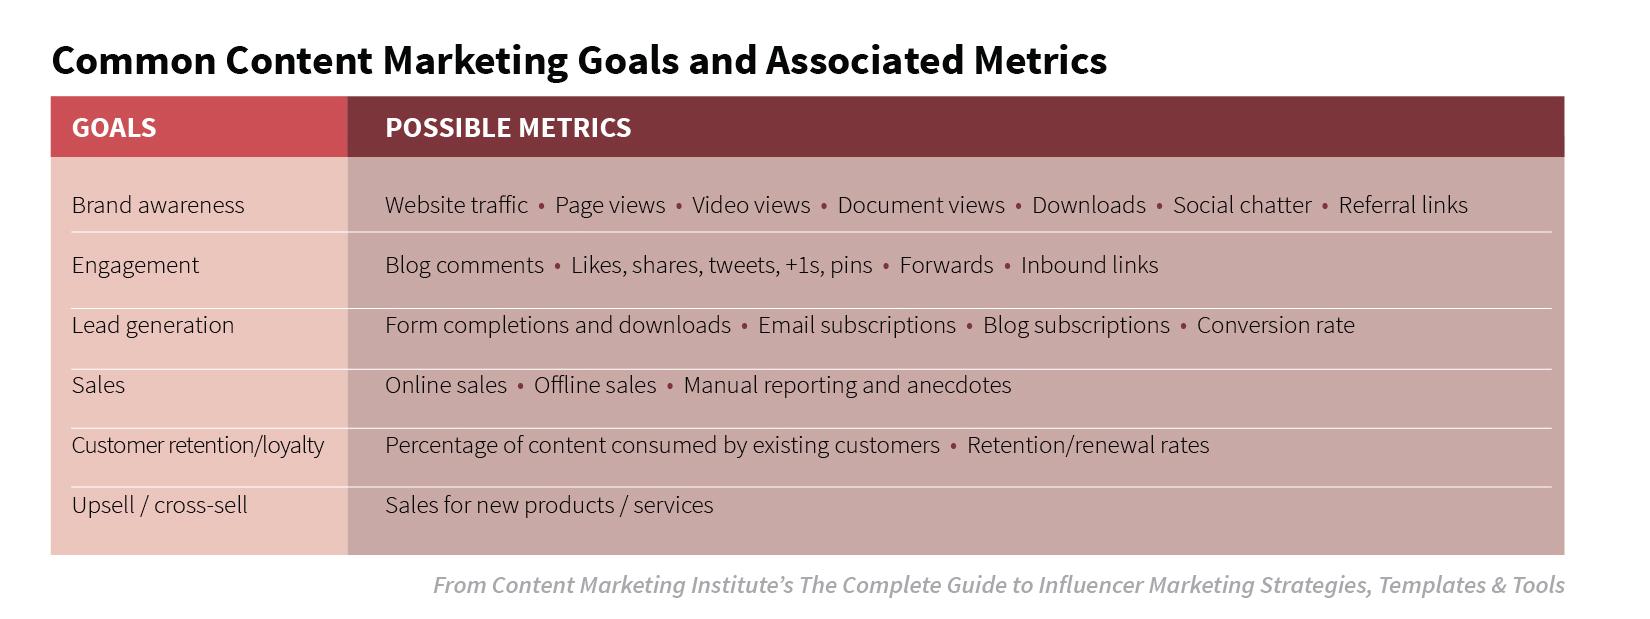 June 21 2012 process performance metrics presentation.